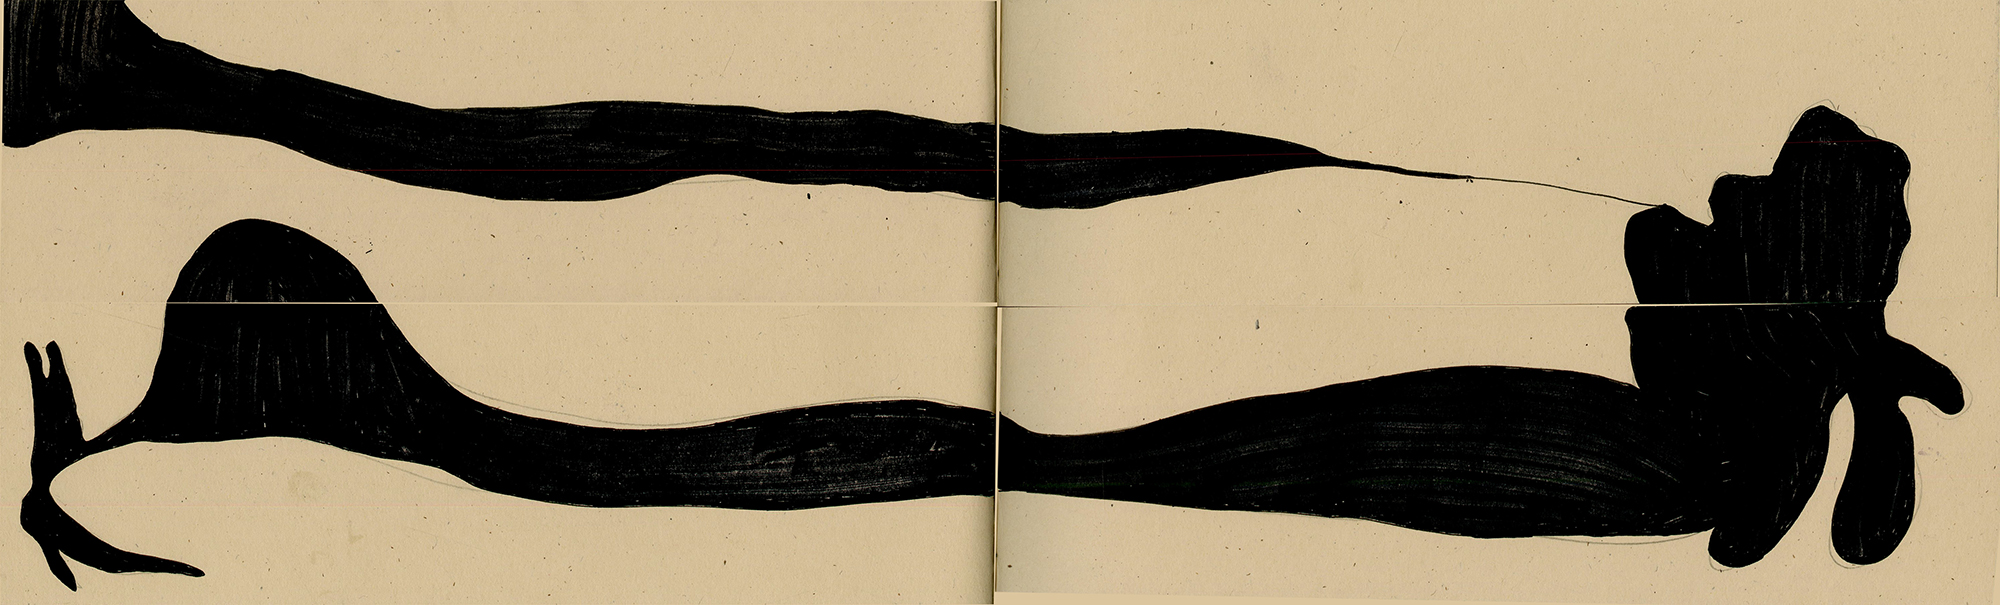 River Book I(Top), River Book II(Bottom), Page 13, No-Name Rivers